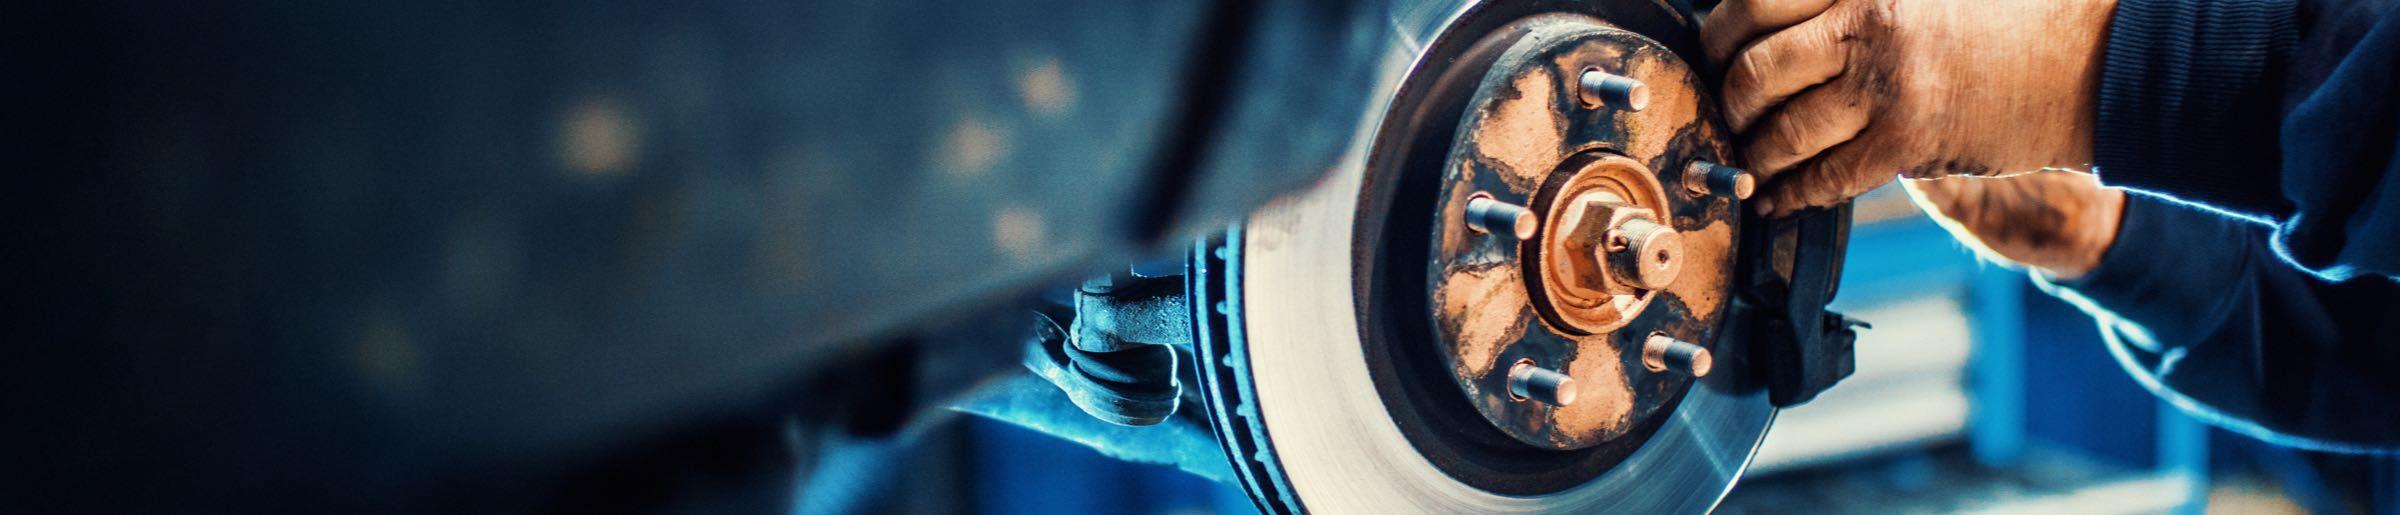 Parts | Auto brakes & Service | Car Service Taree | Brake Clutch Car